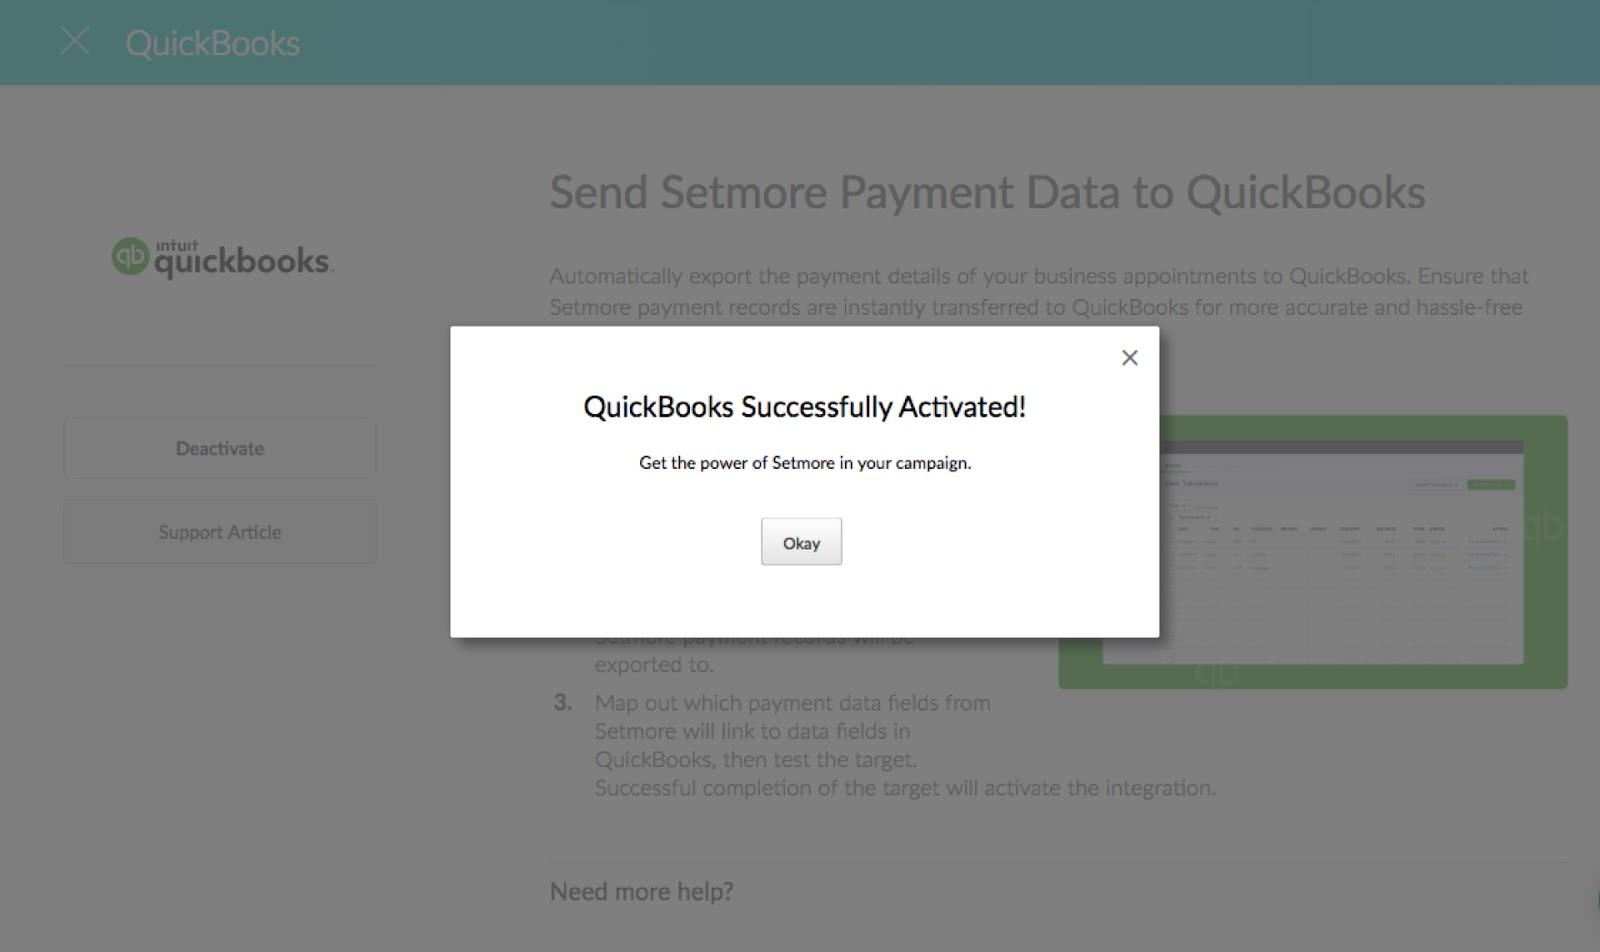 Setmore-QuickBooks Integration activation pop-up message